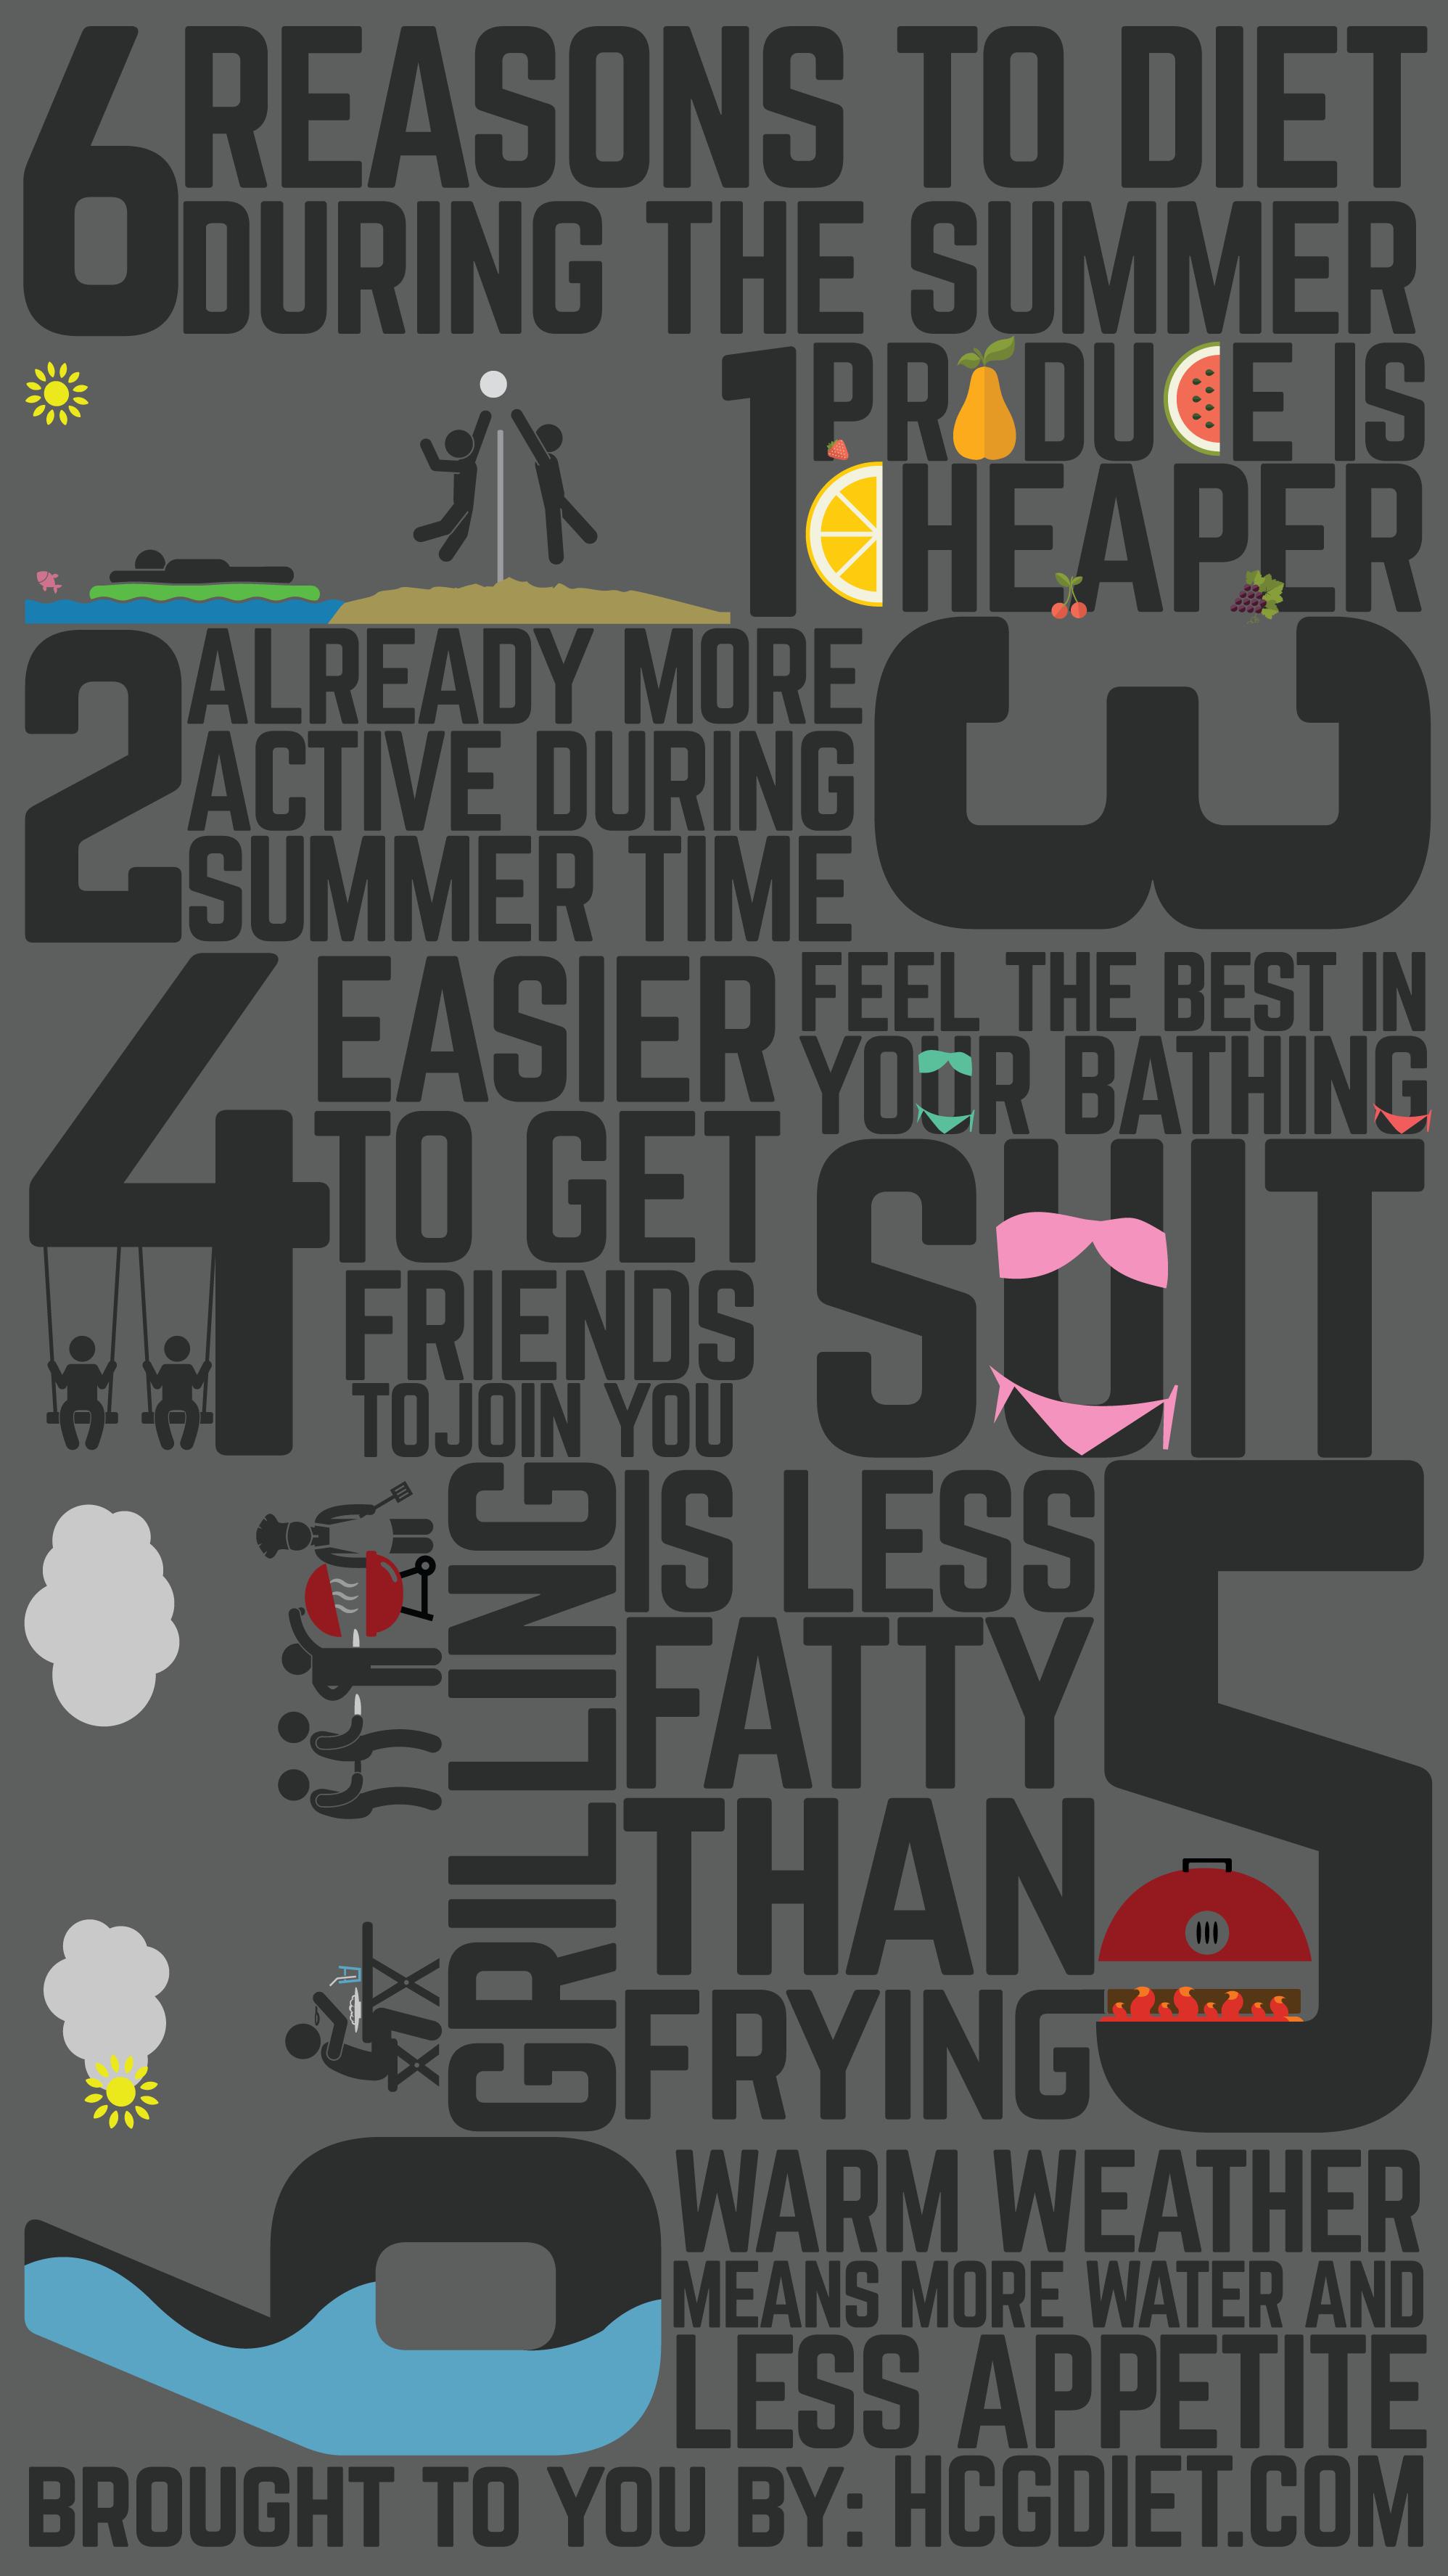 The Summer Shred: Your Beach-Body Program!